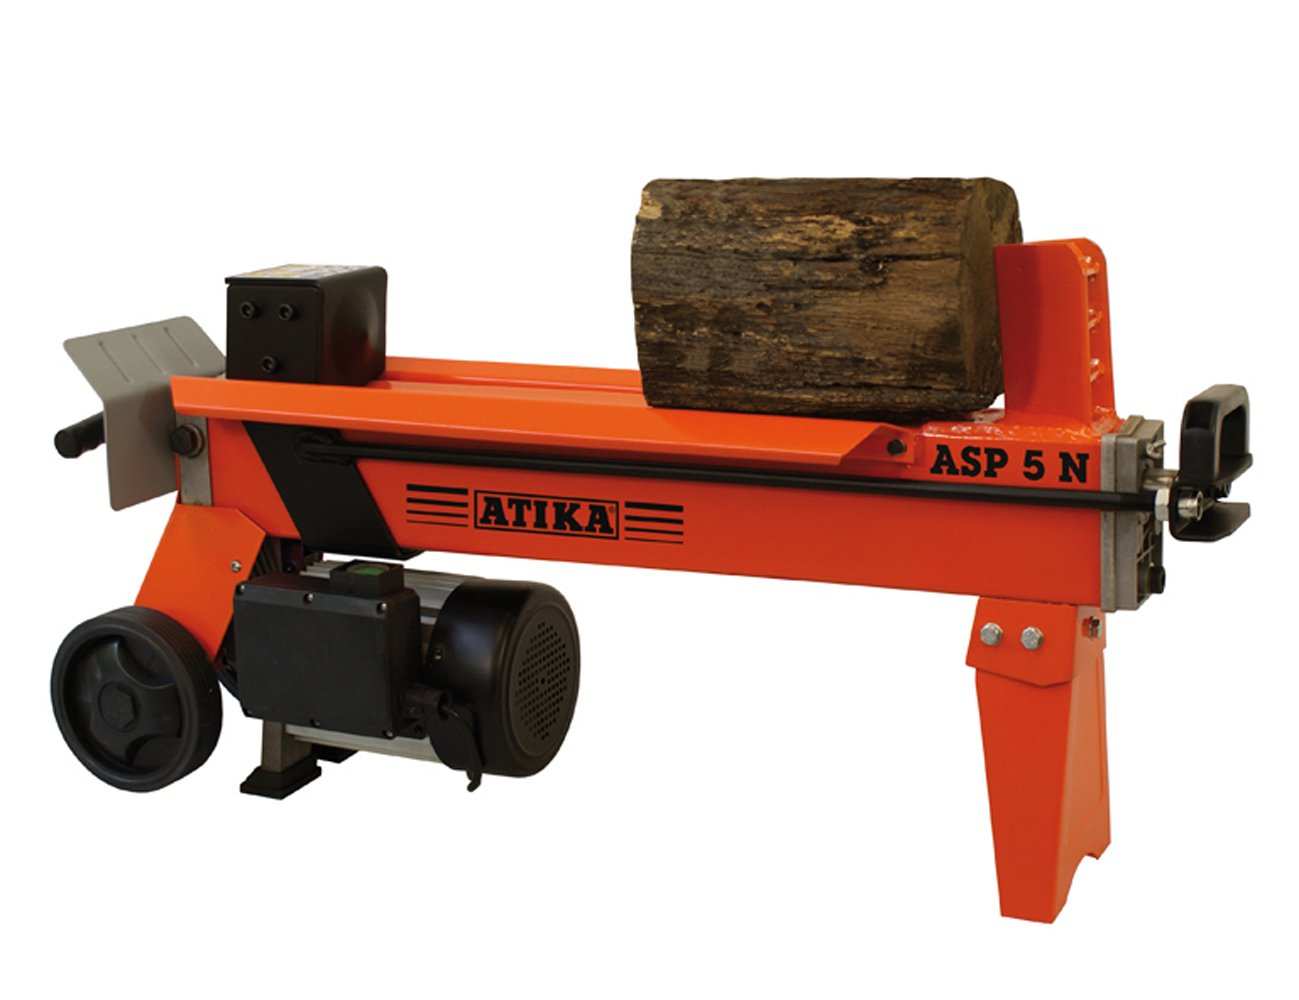 Atika 301780 Brennholzspalter ASP 5N